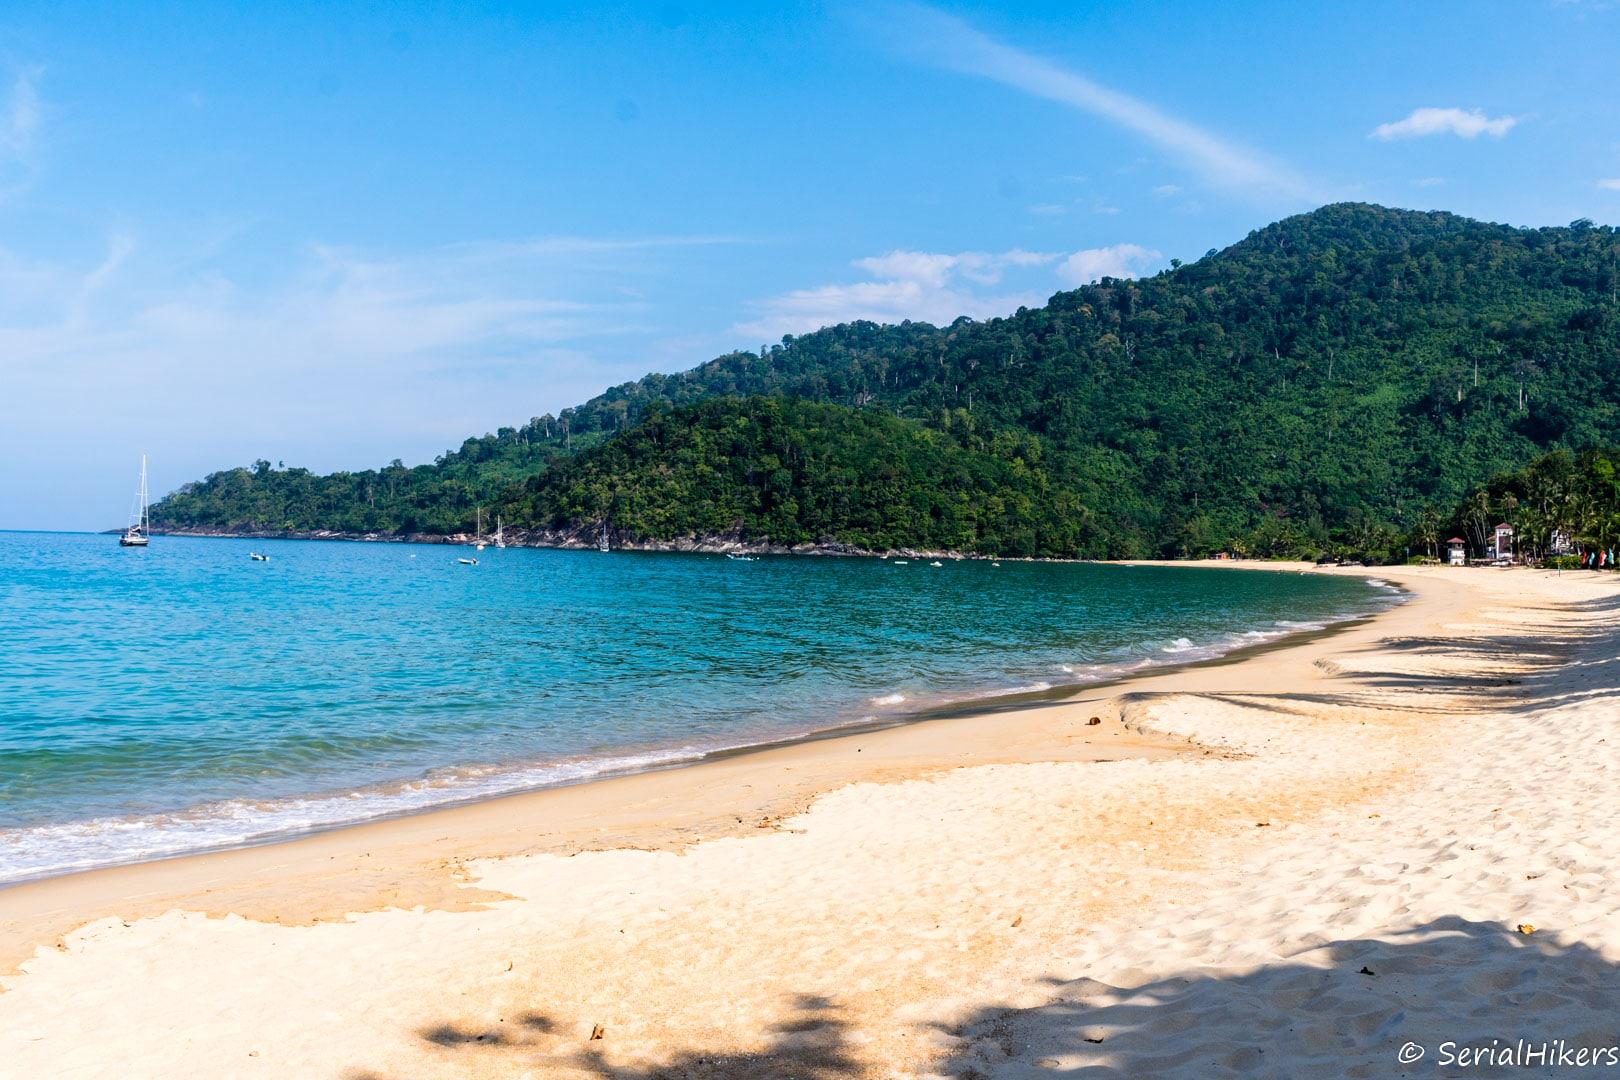 SerialHikers stop autostop world monde tour hitchhiking aventure adventure alternative travel voyage sans avion no fly malaisie malaysia ile island Tioman